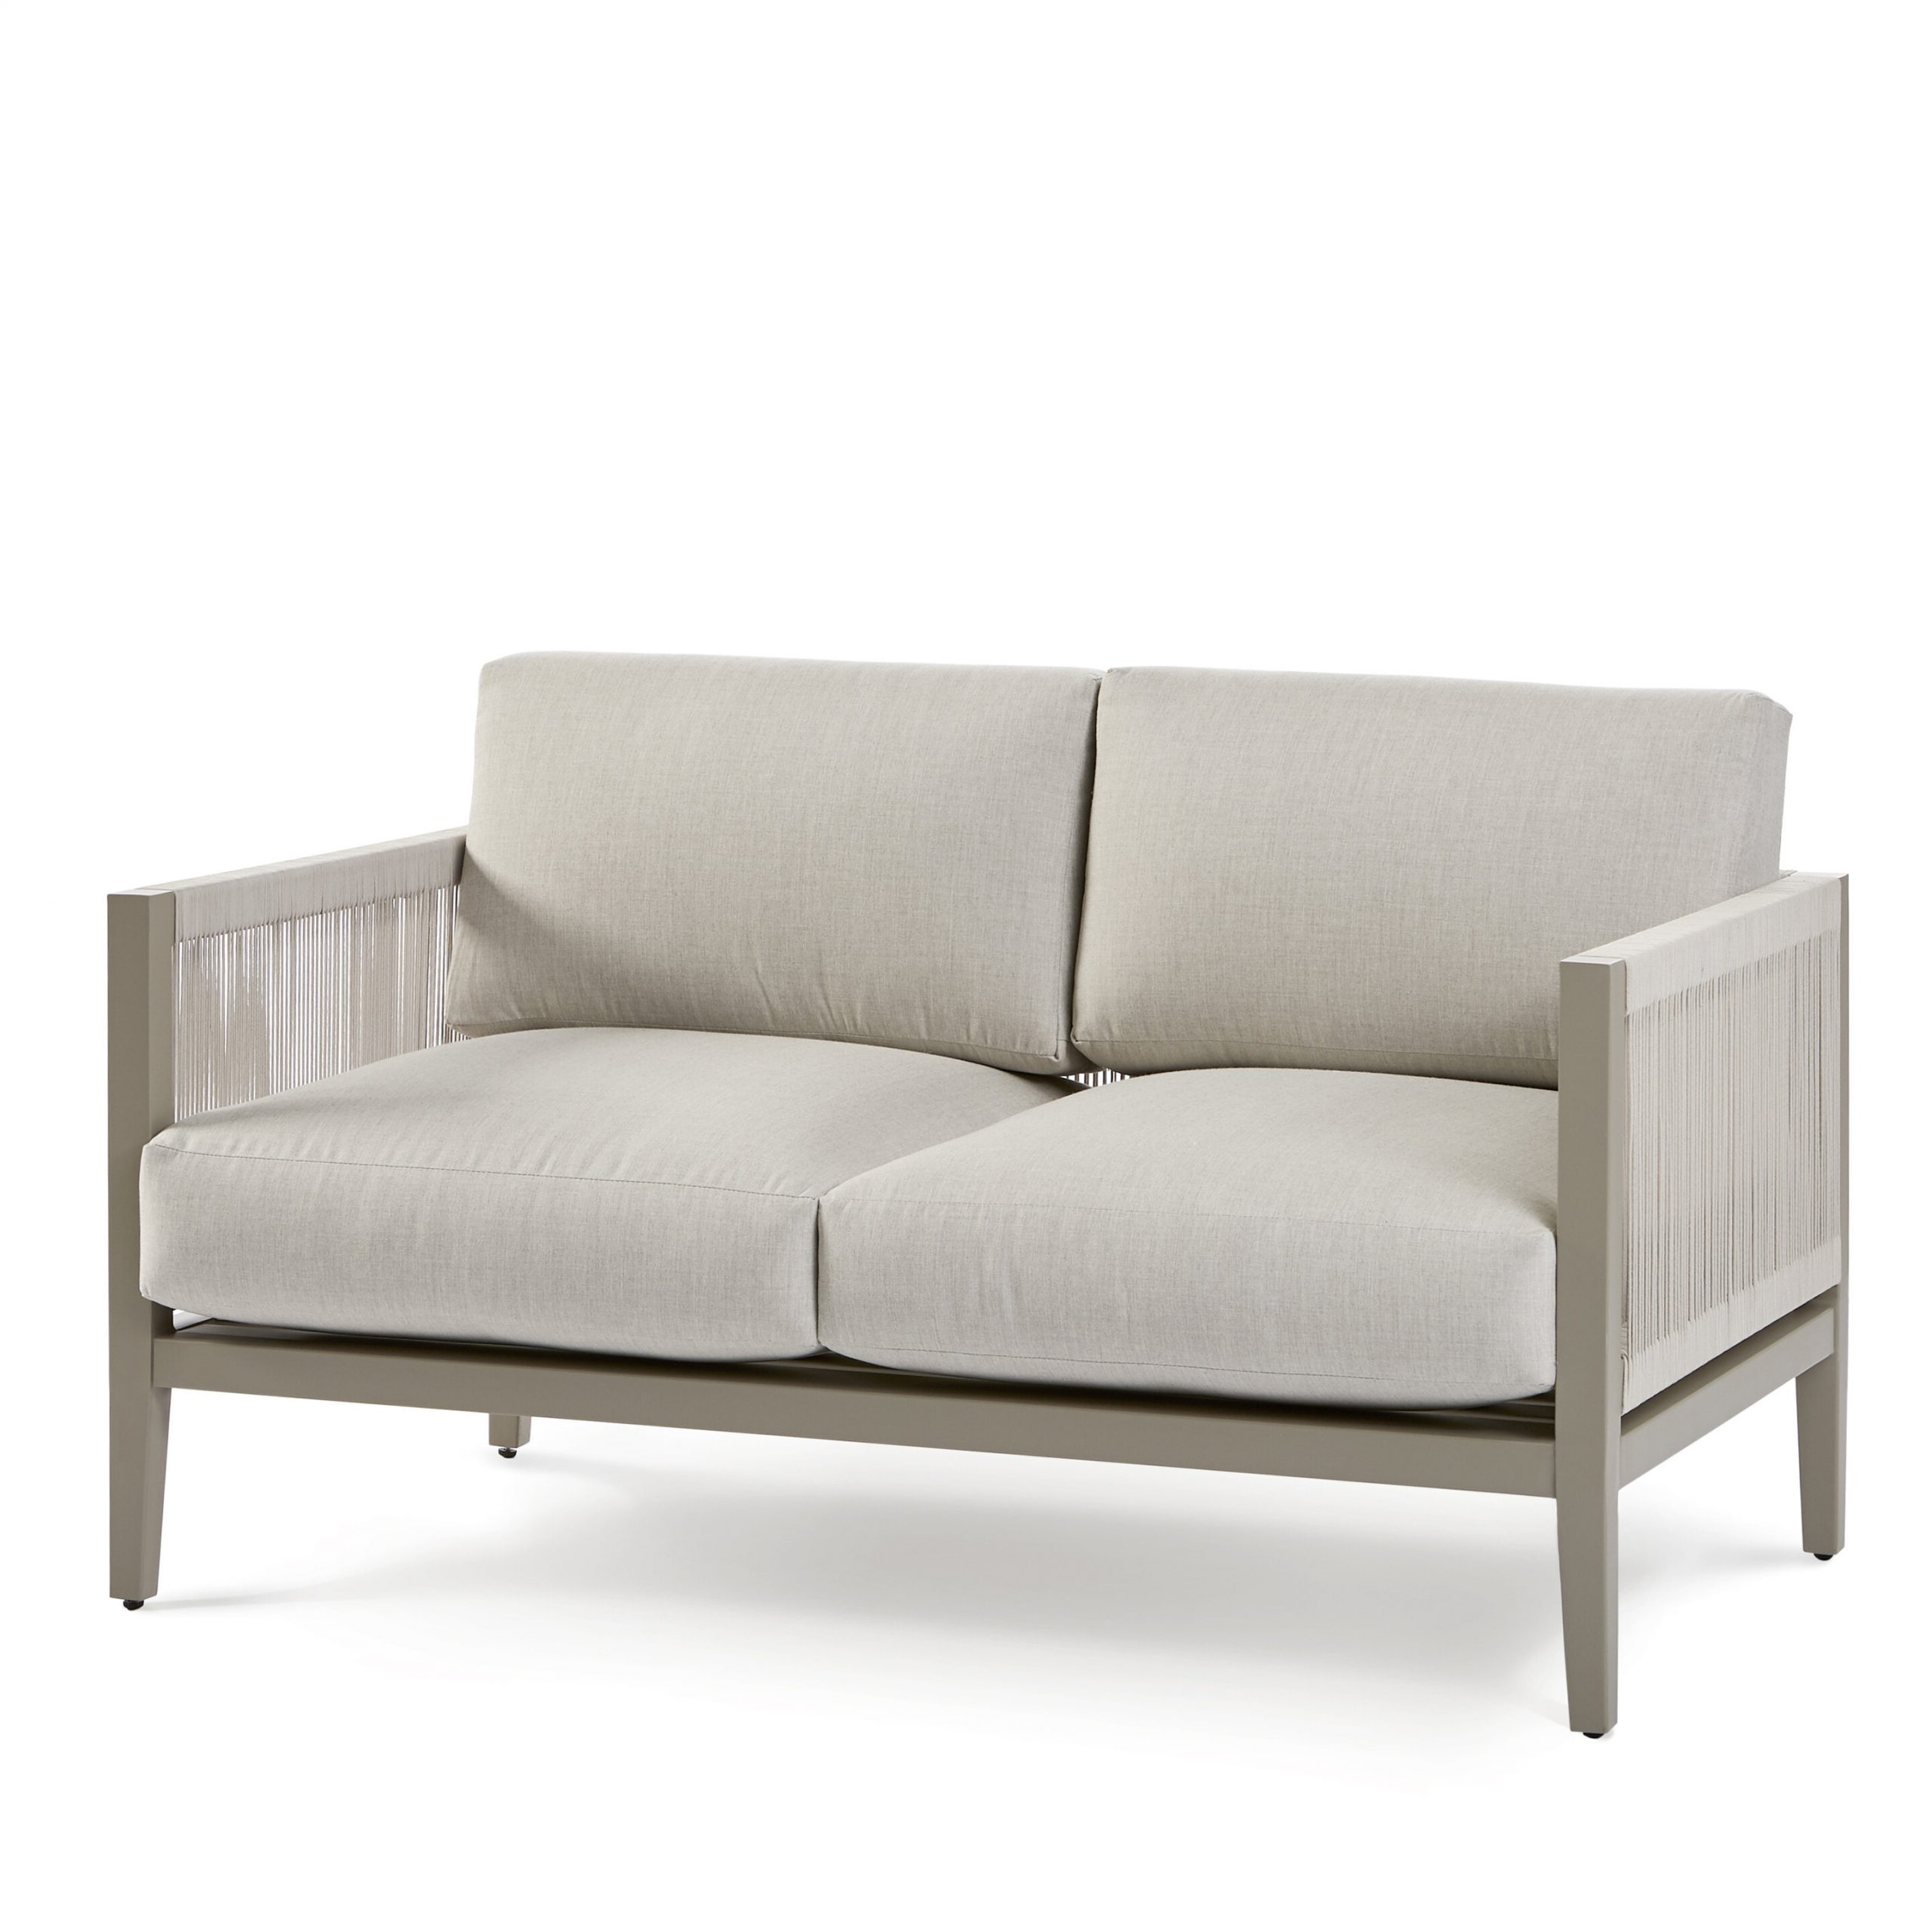 Latest Kari Loveseat With Sunbrella Cushions Regarding Jamilla Teak Patio Sofas With Cushion (Gallery 23 of 25)